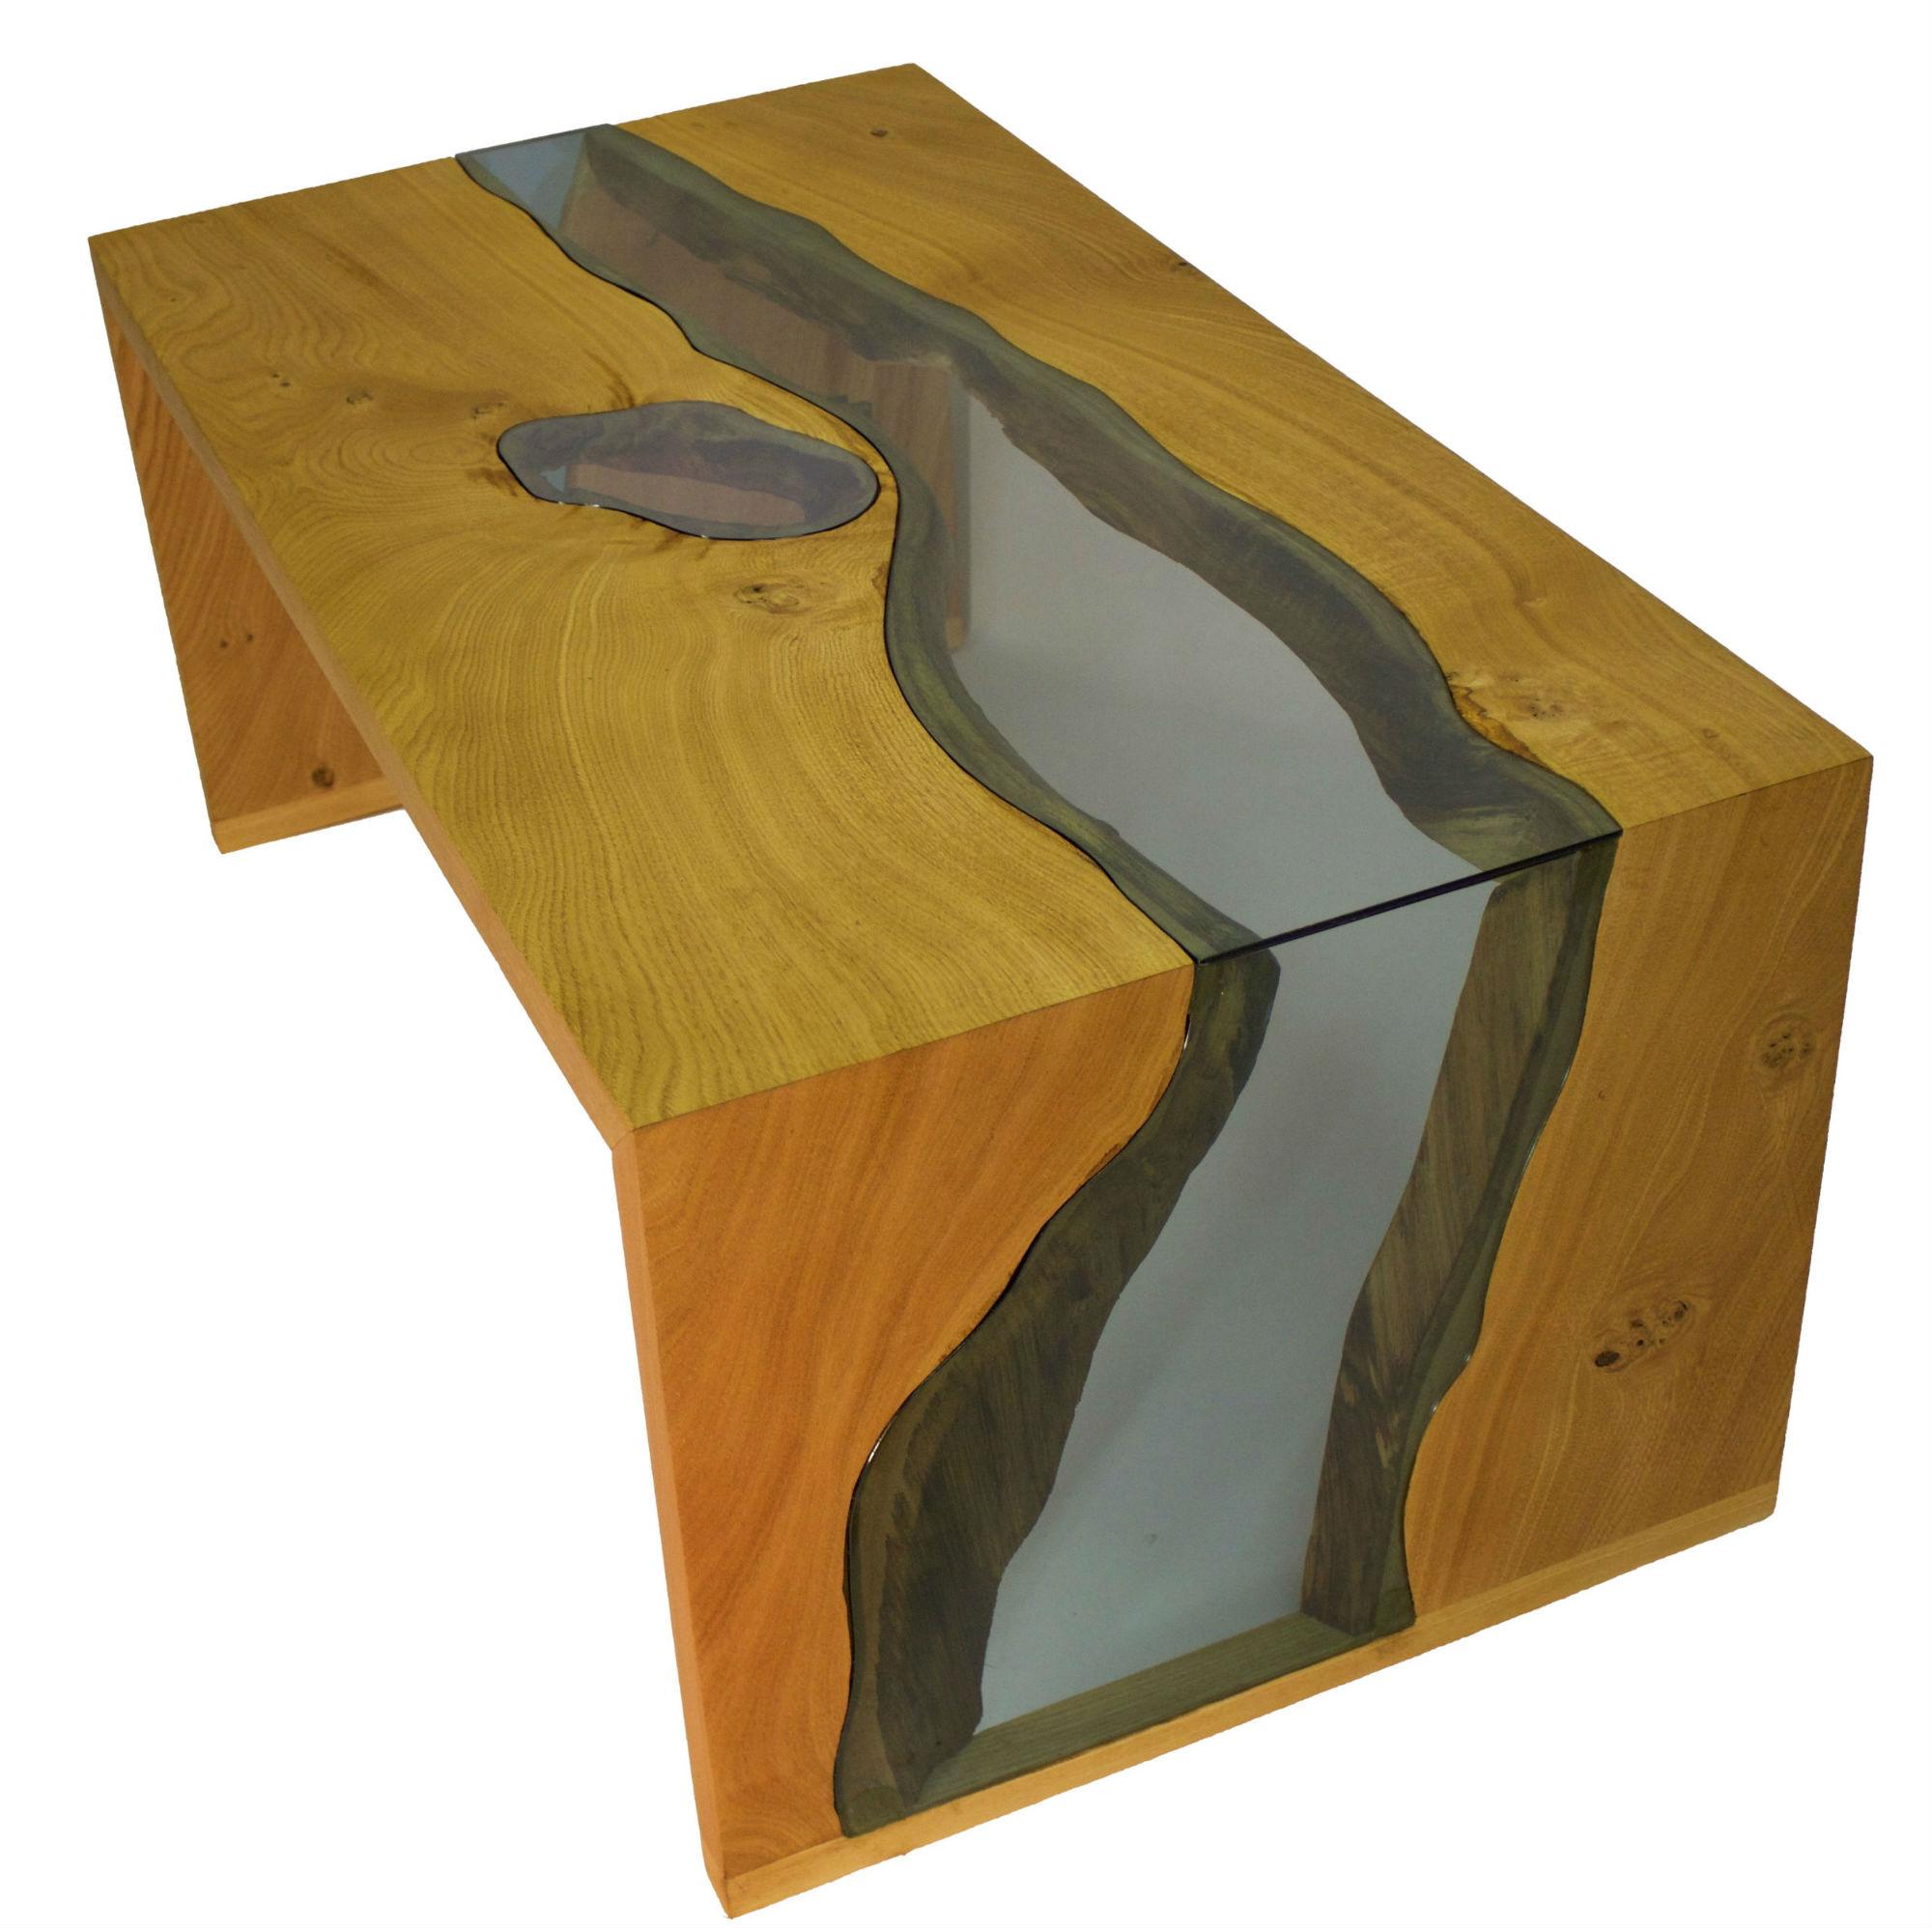 Waterfall table